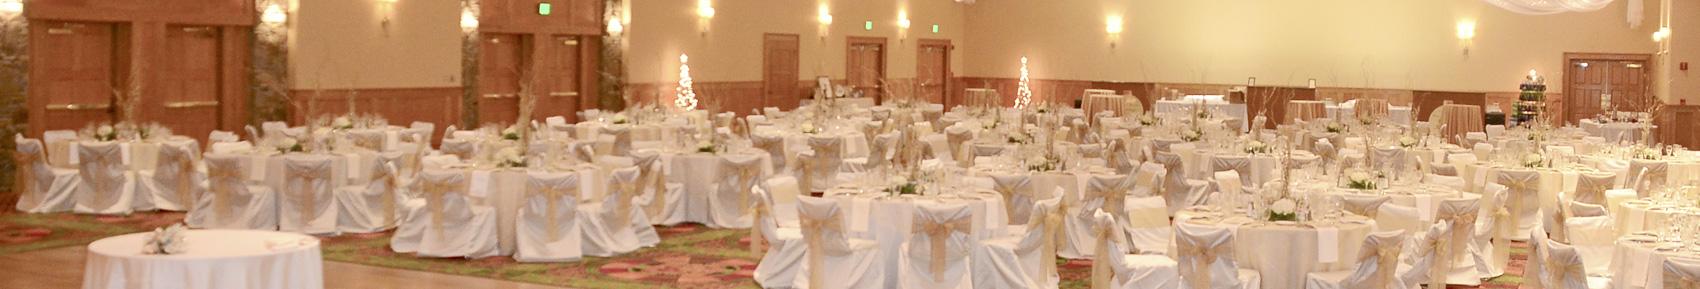 grand-ballroom-reception-1